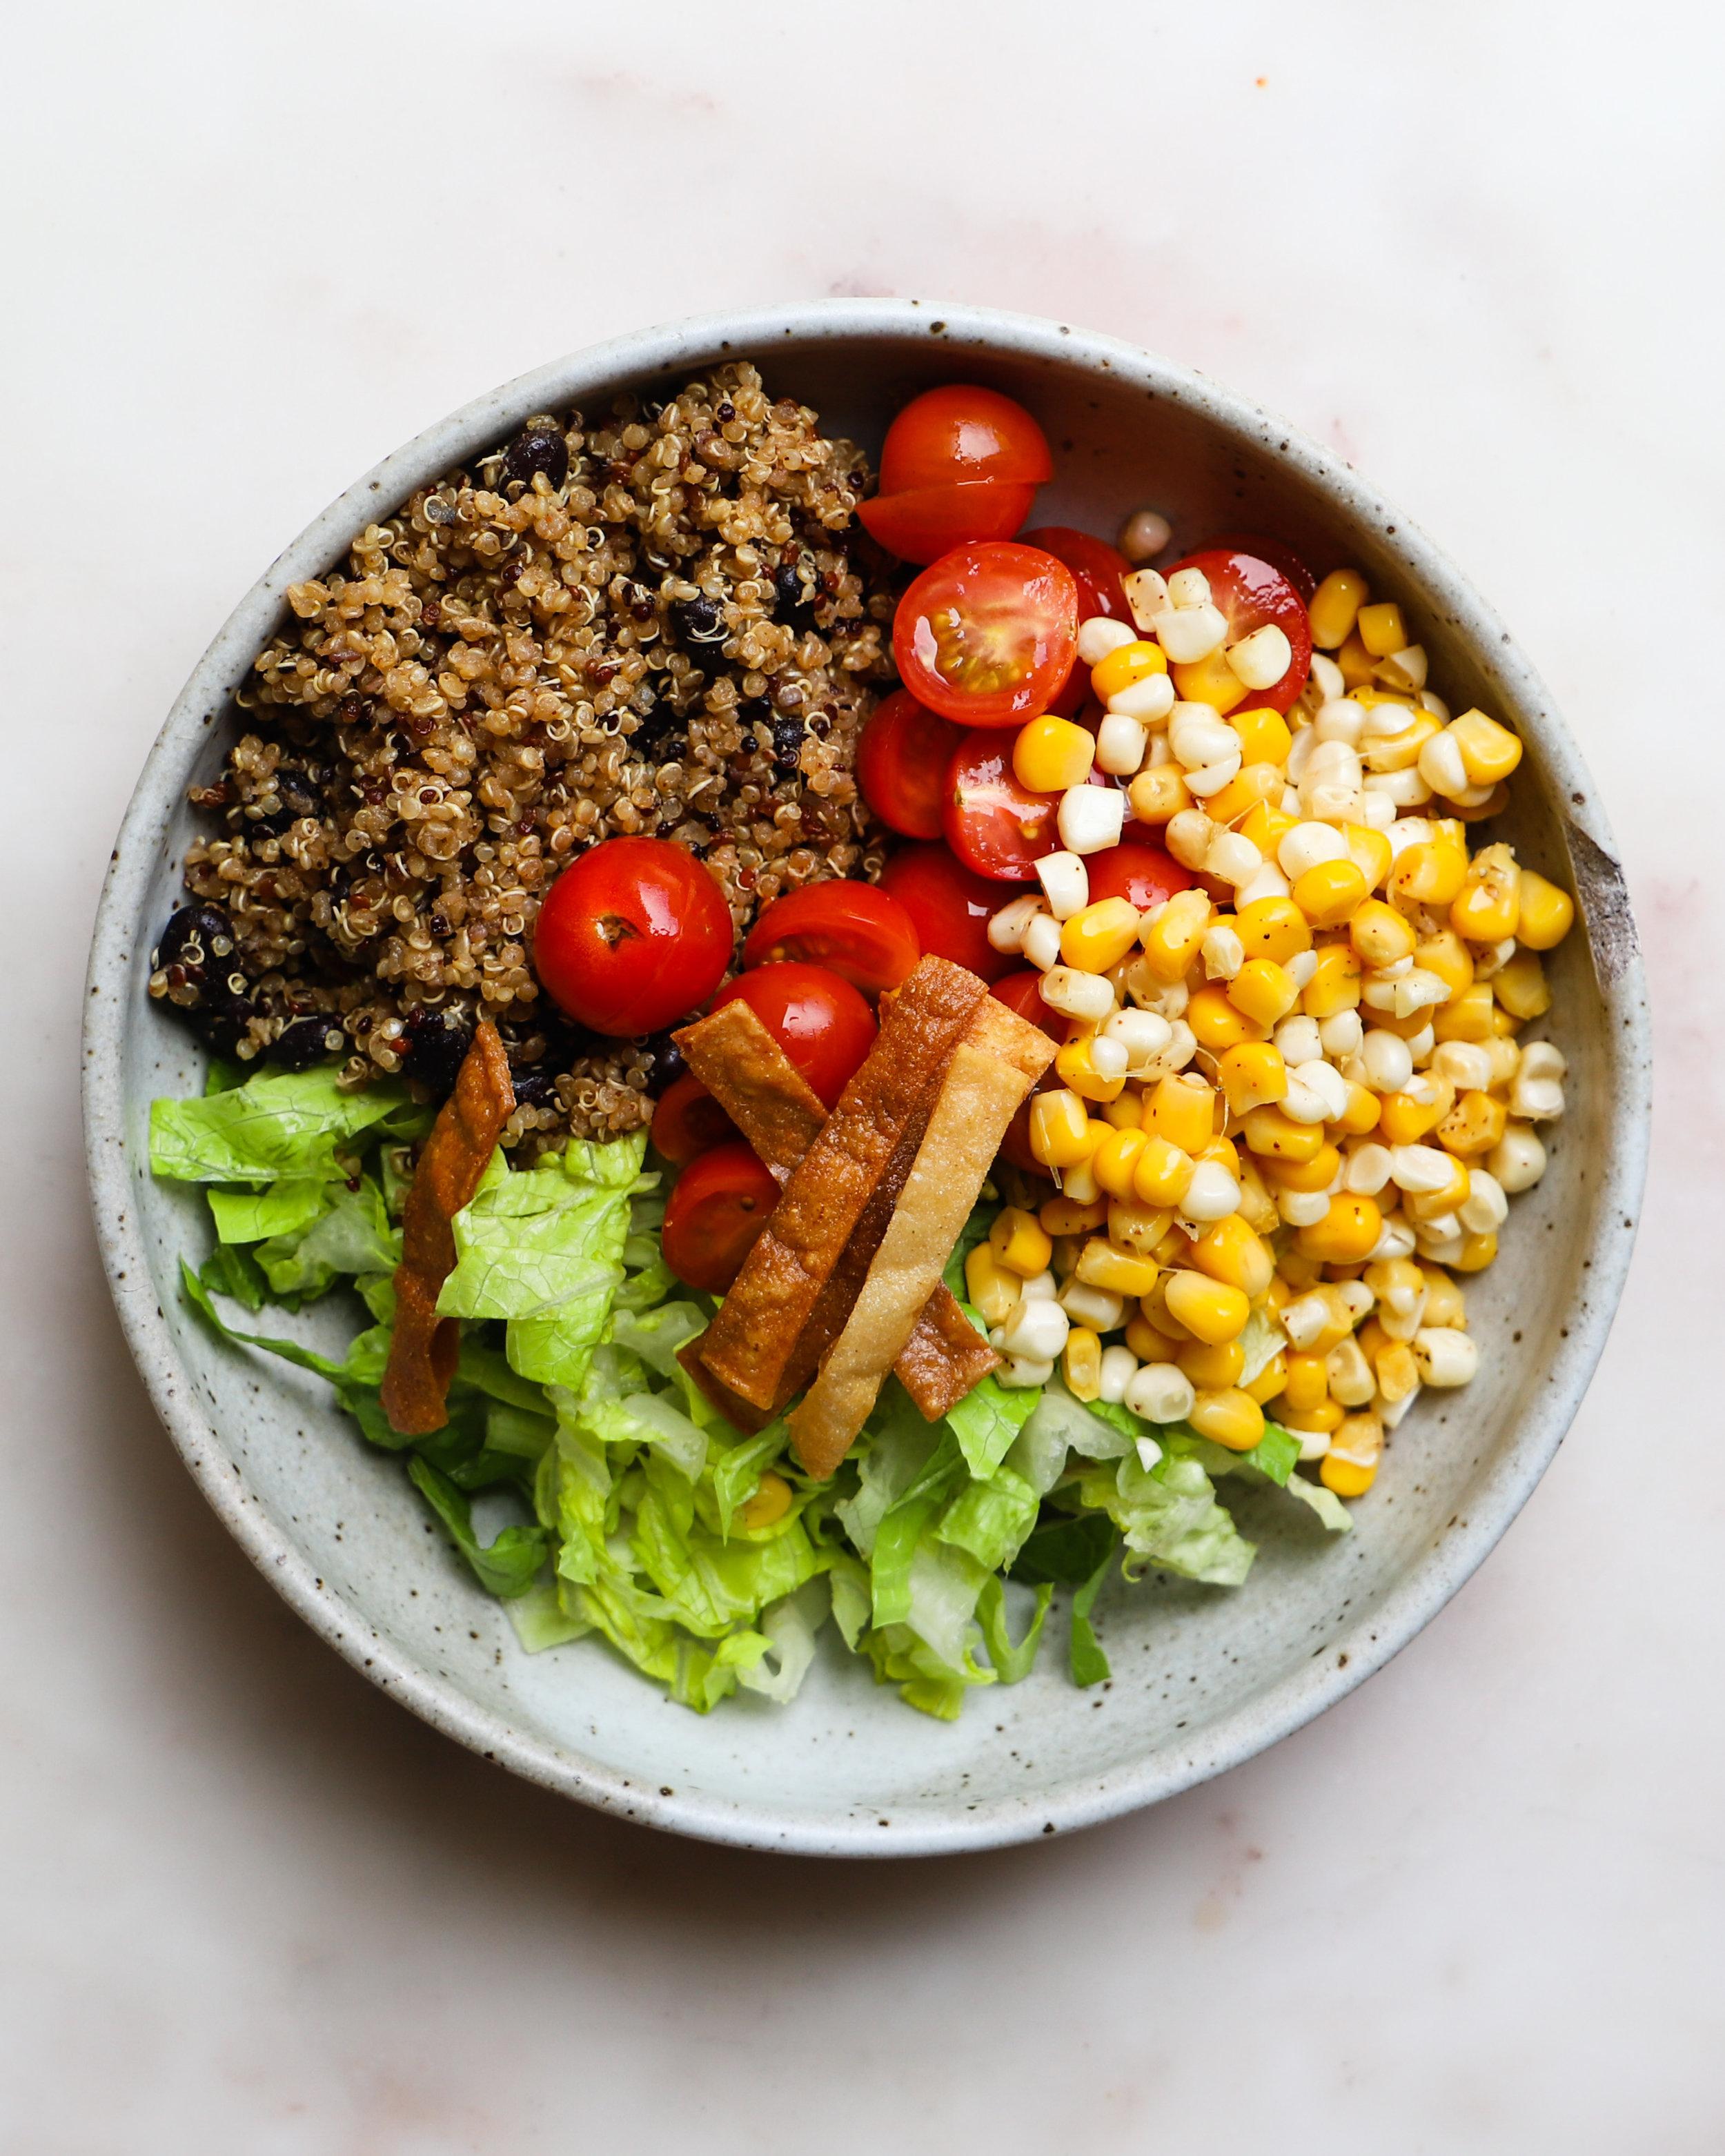 Lindseyeatsla_Taco_Salad_Chipotle_Dressing-14.jpg